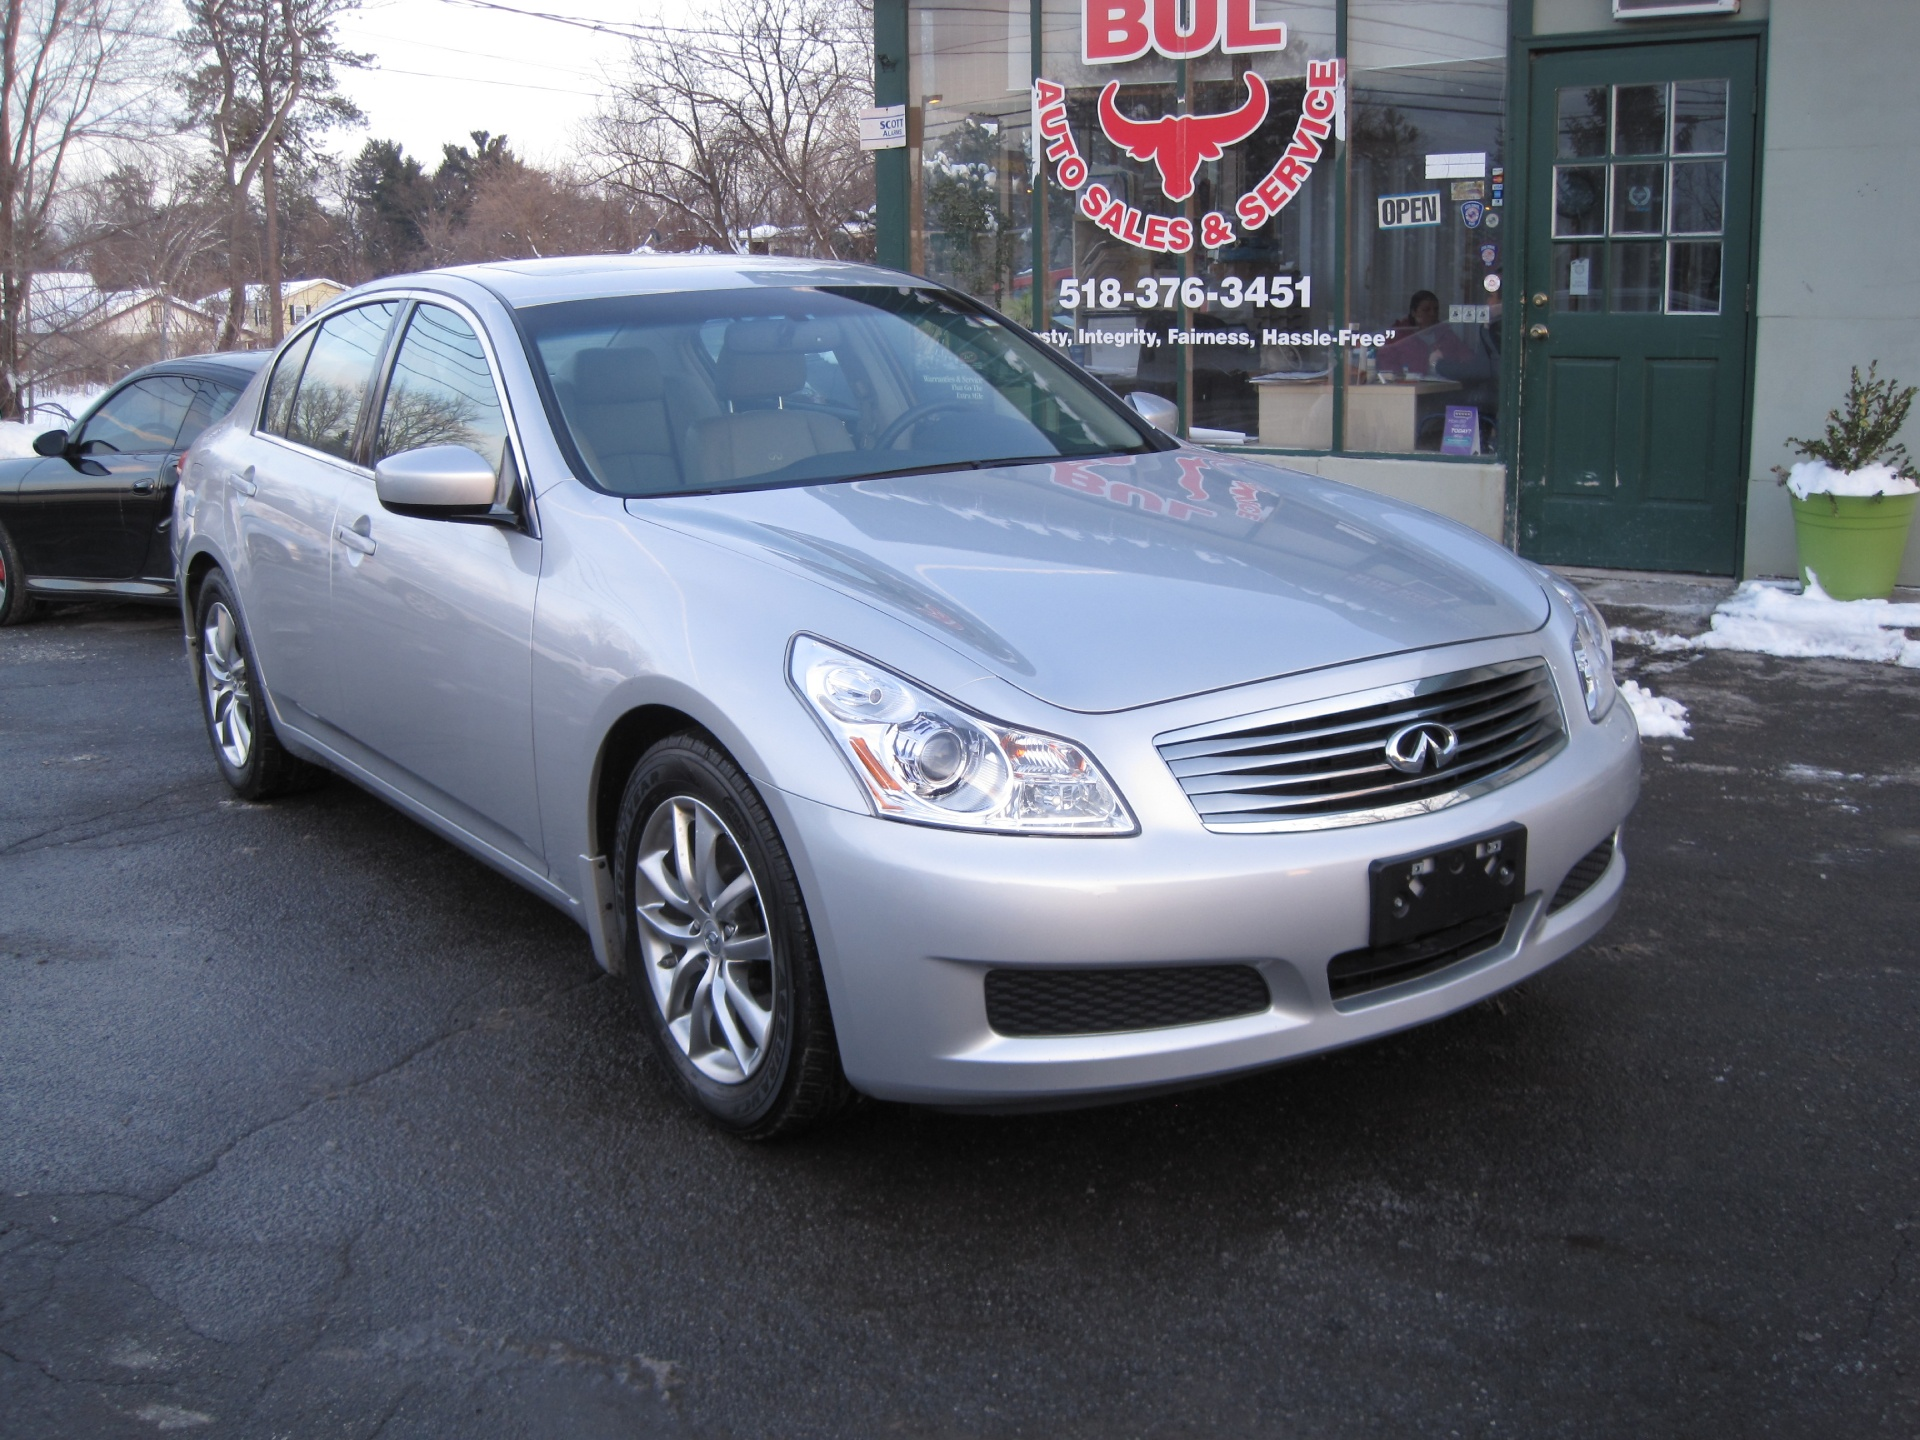 2009 Infiniti G37 Sedan Journey Stock 14214 For Sale Near Albany Remote Start Used Ny